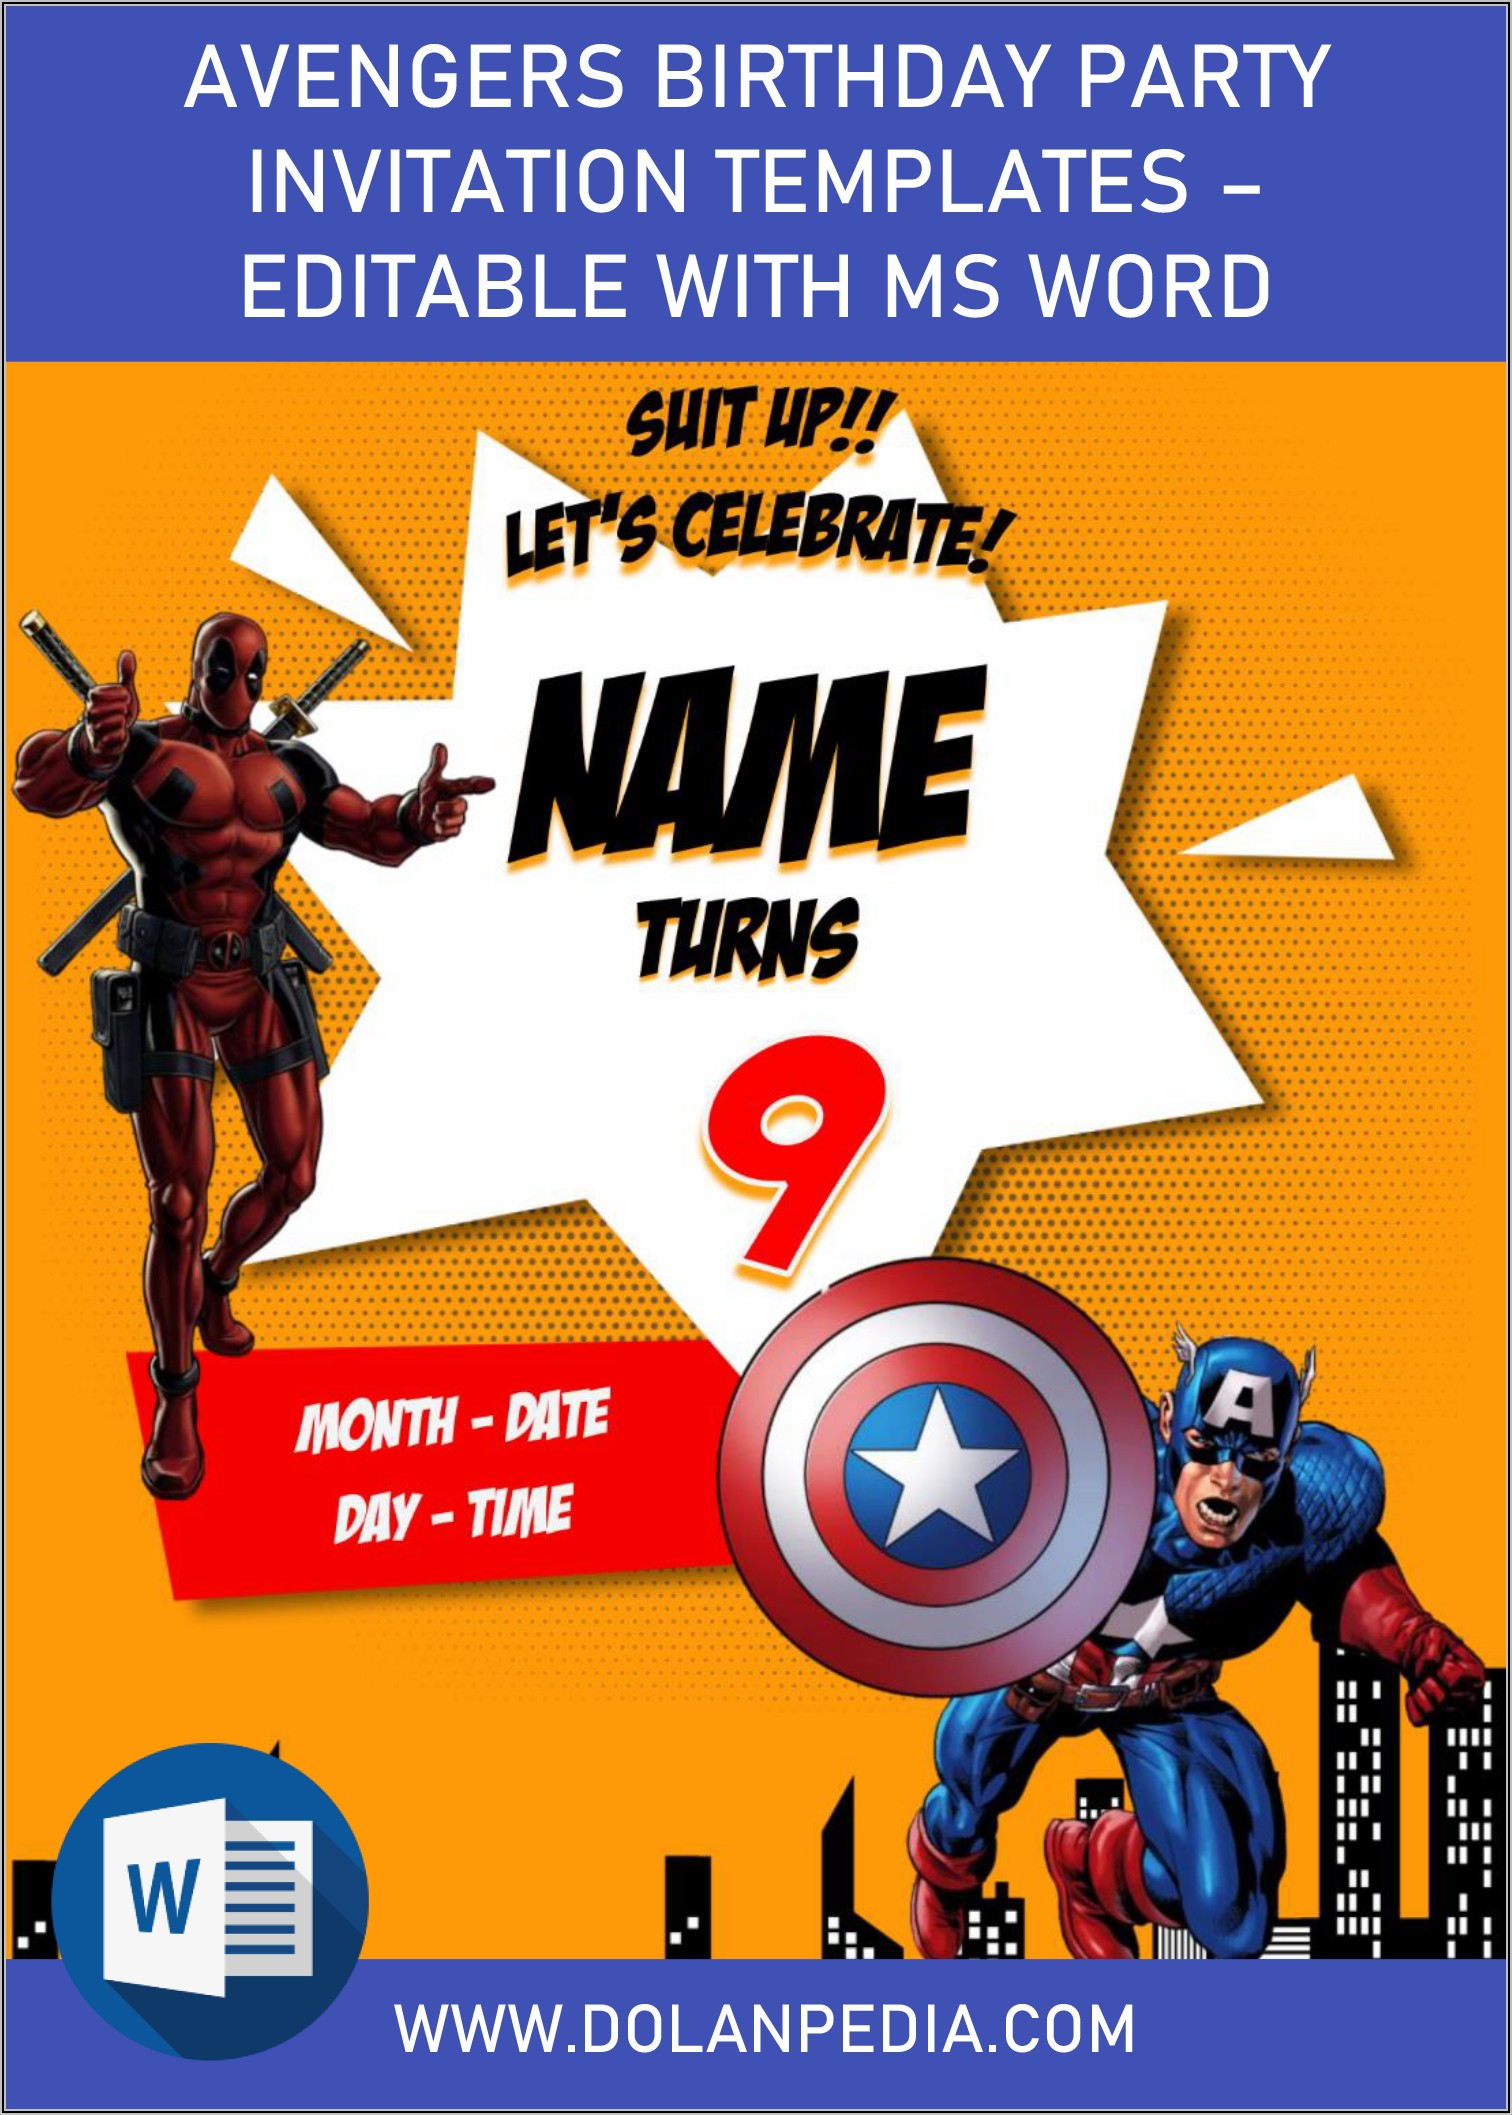 Editable Avengers Invitation Template